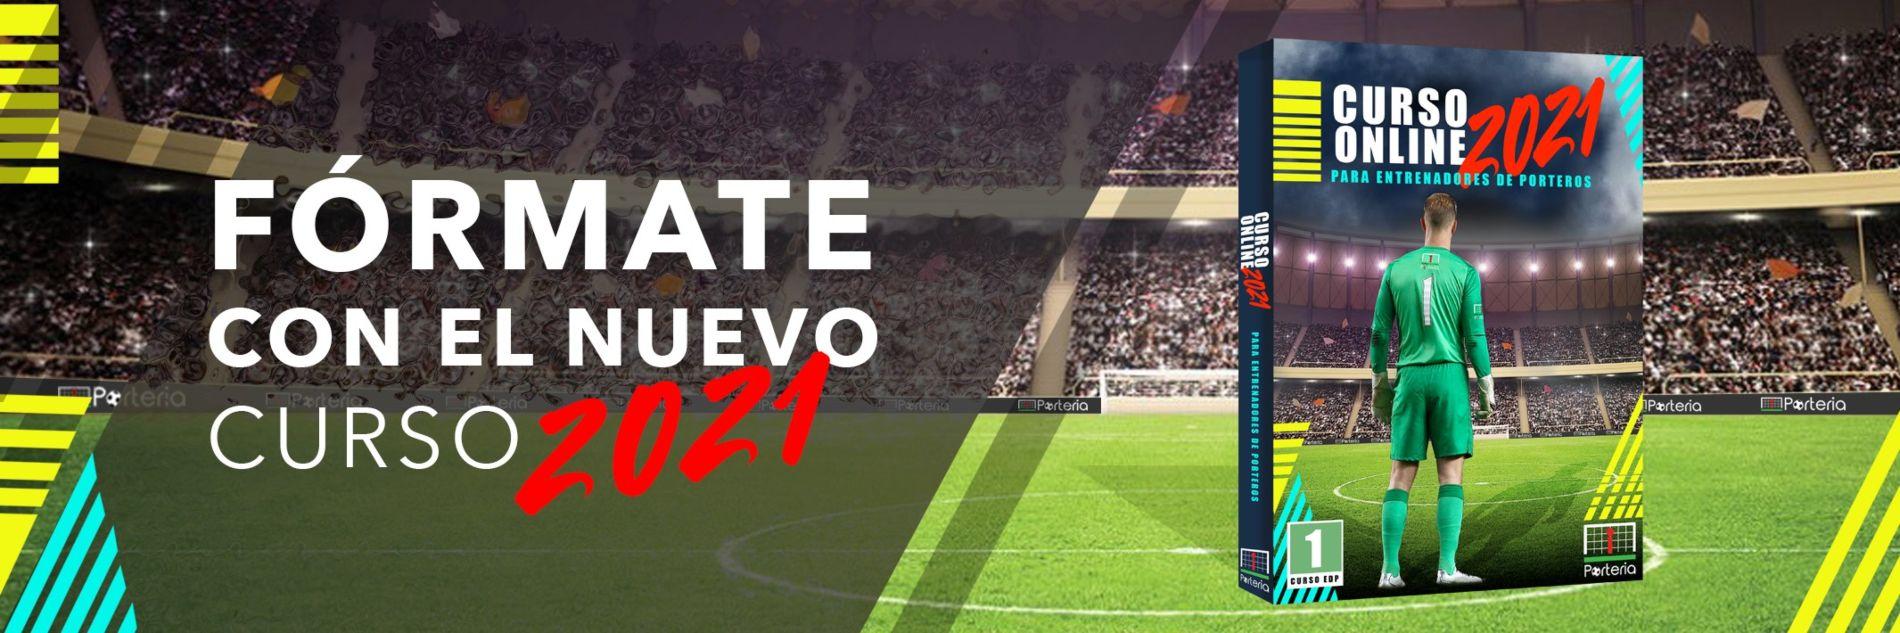 curso online entrenadores porteros 2021 mp